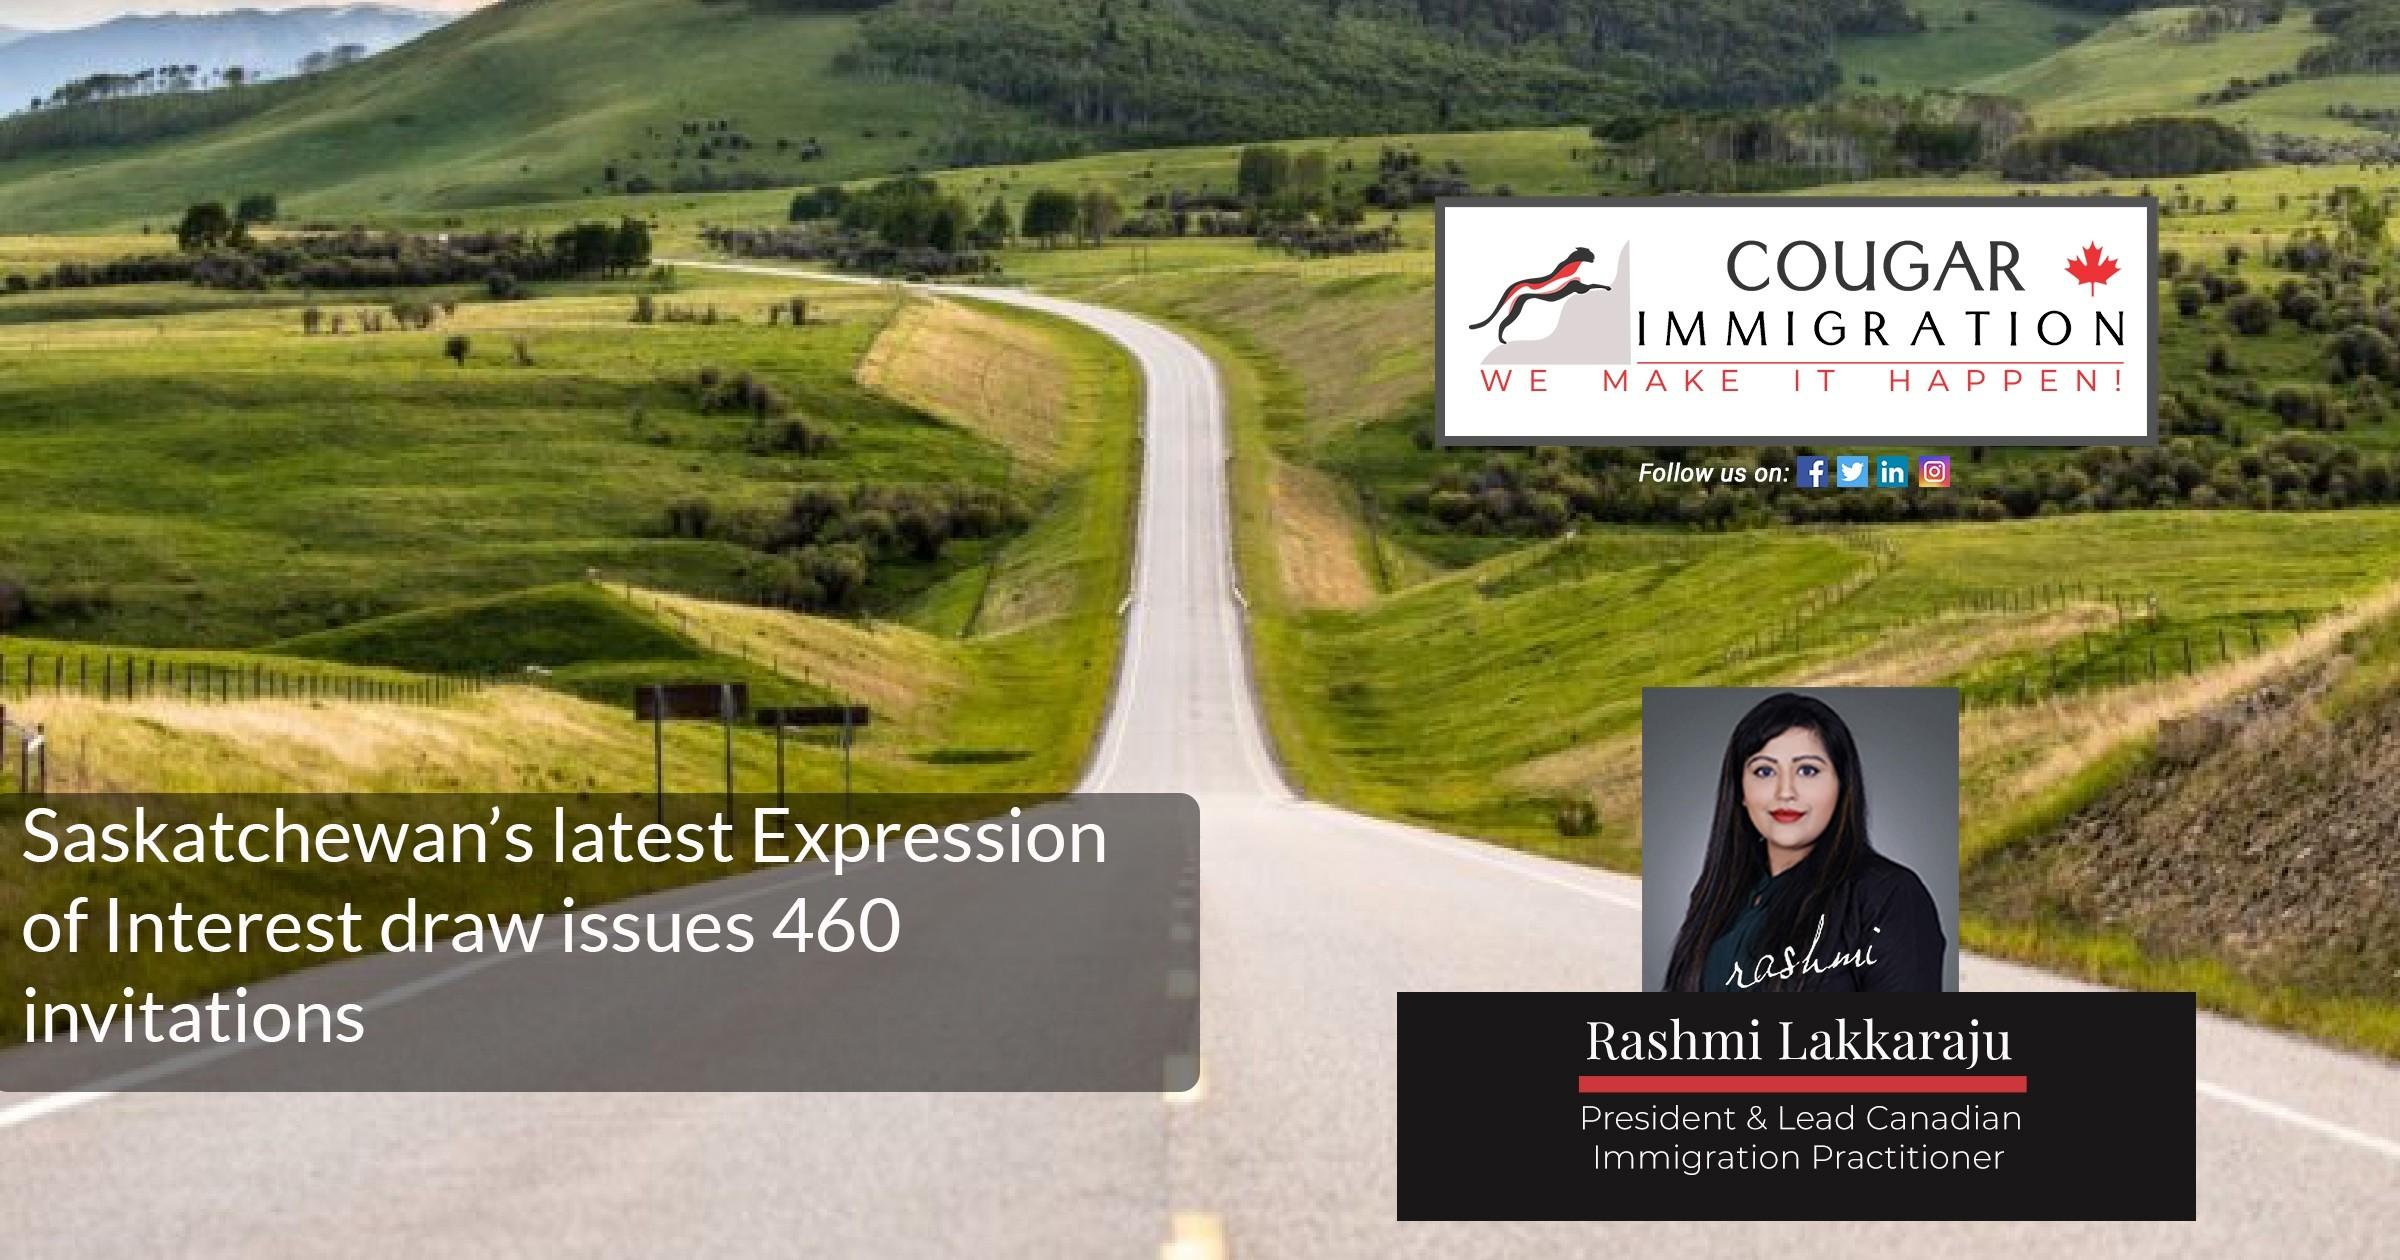 Saskatchewan's latest Expression of Interest draw issues 460 invitations